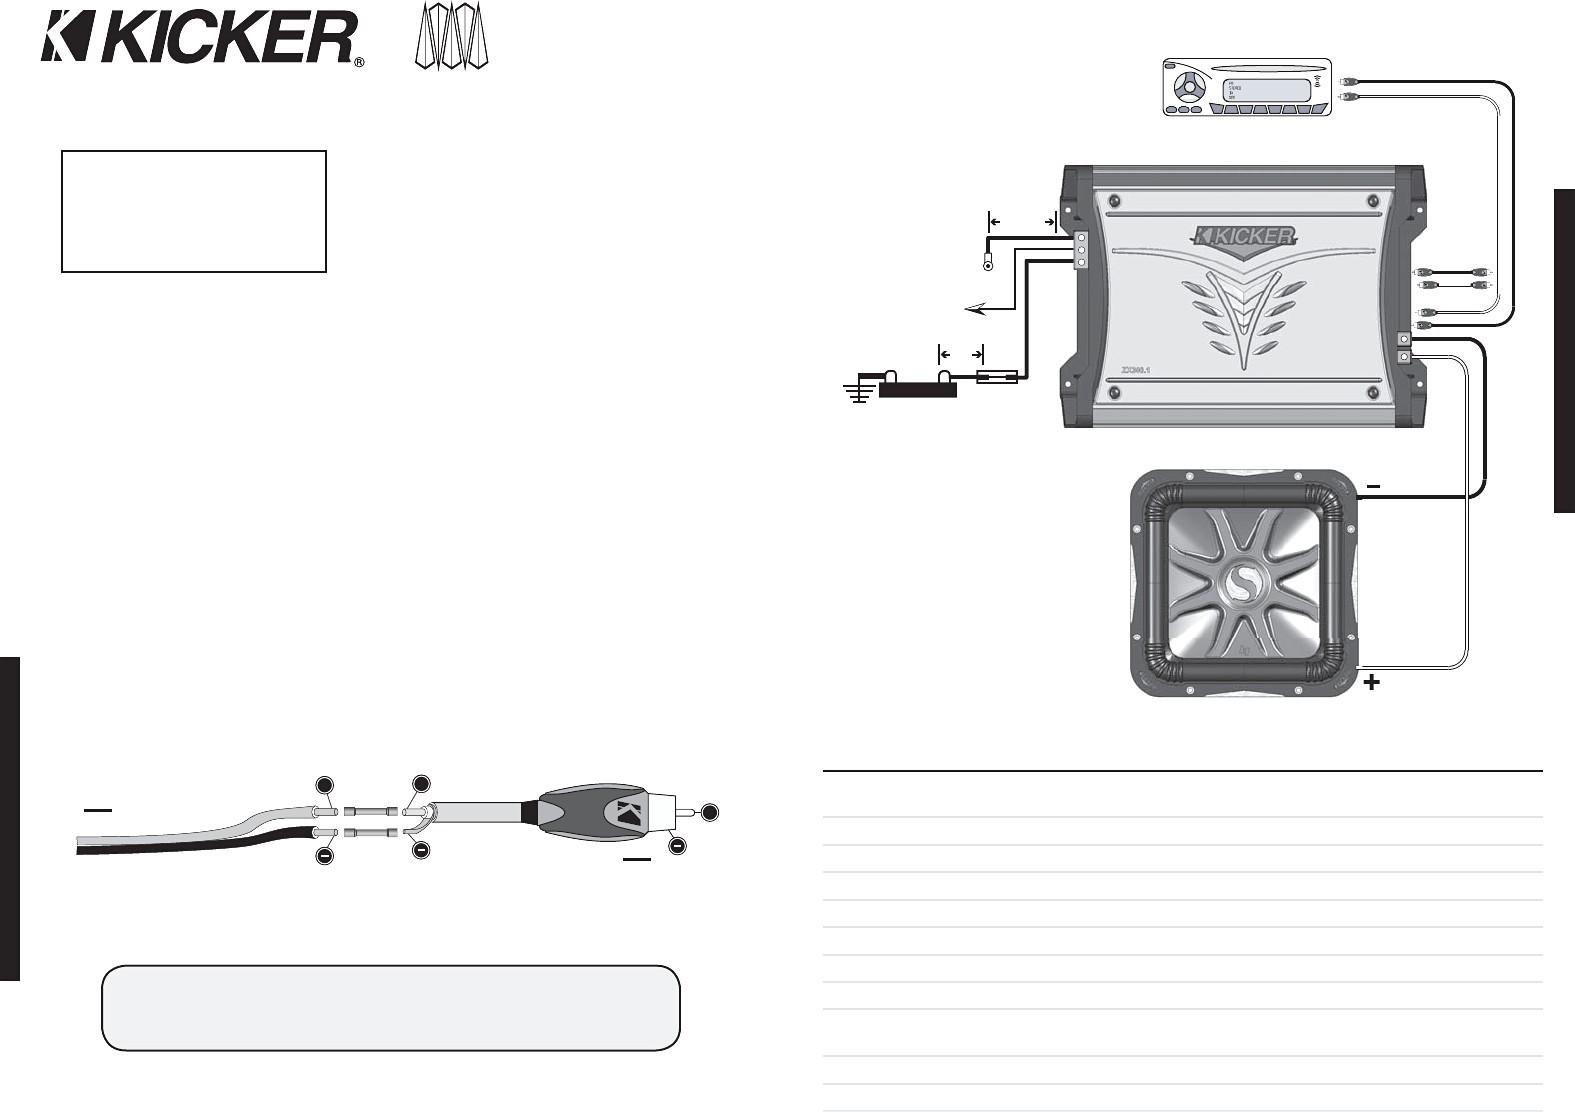 kicker comp 12 wiring diagram - Wiring Diagram